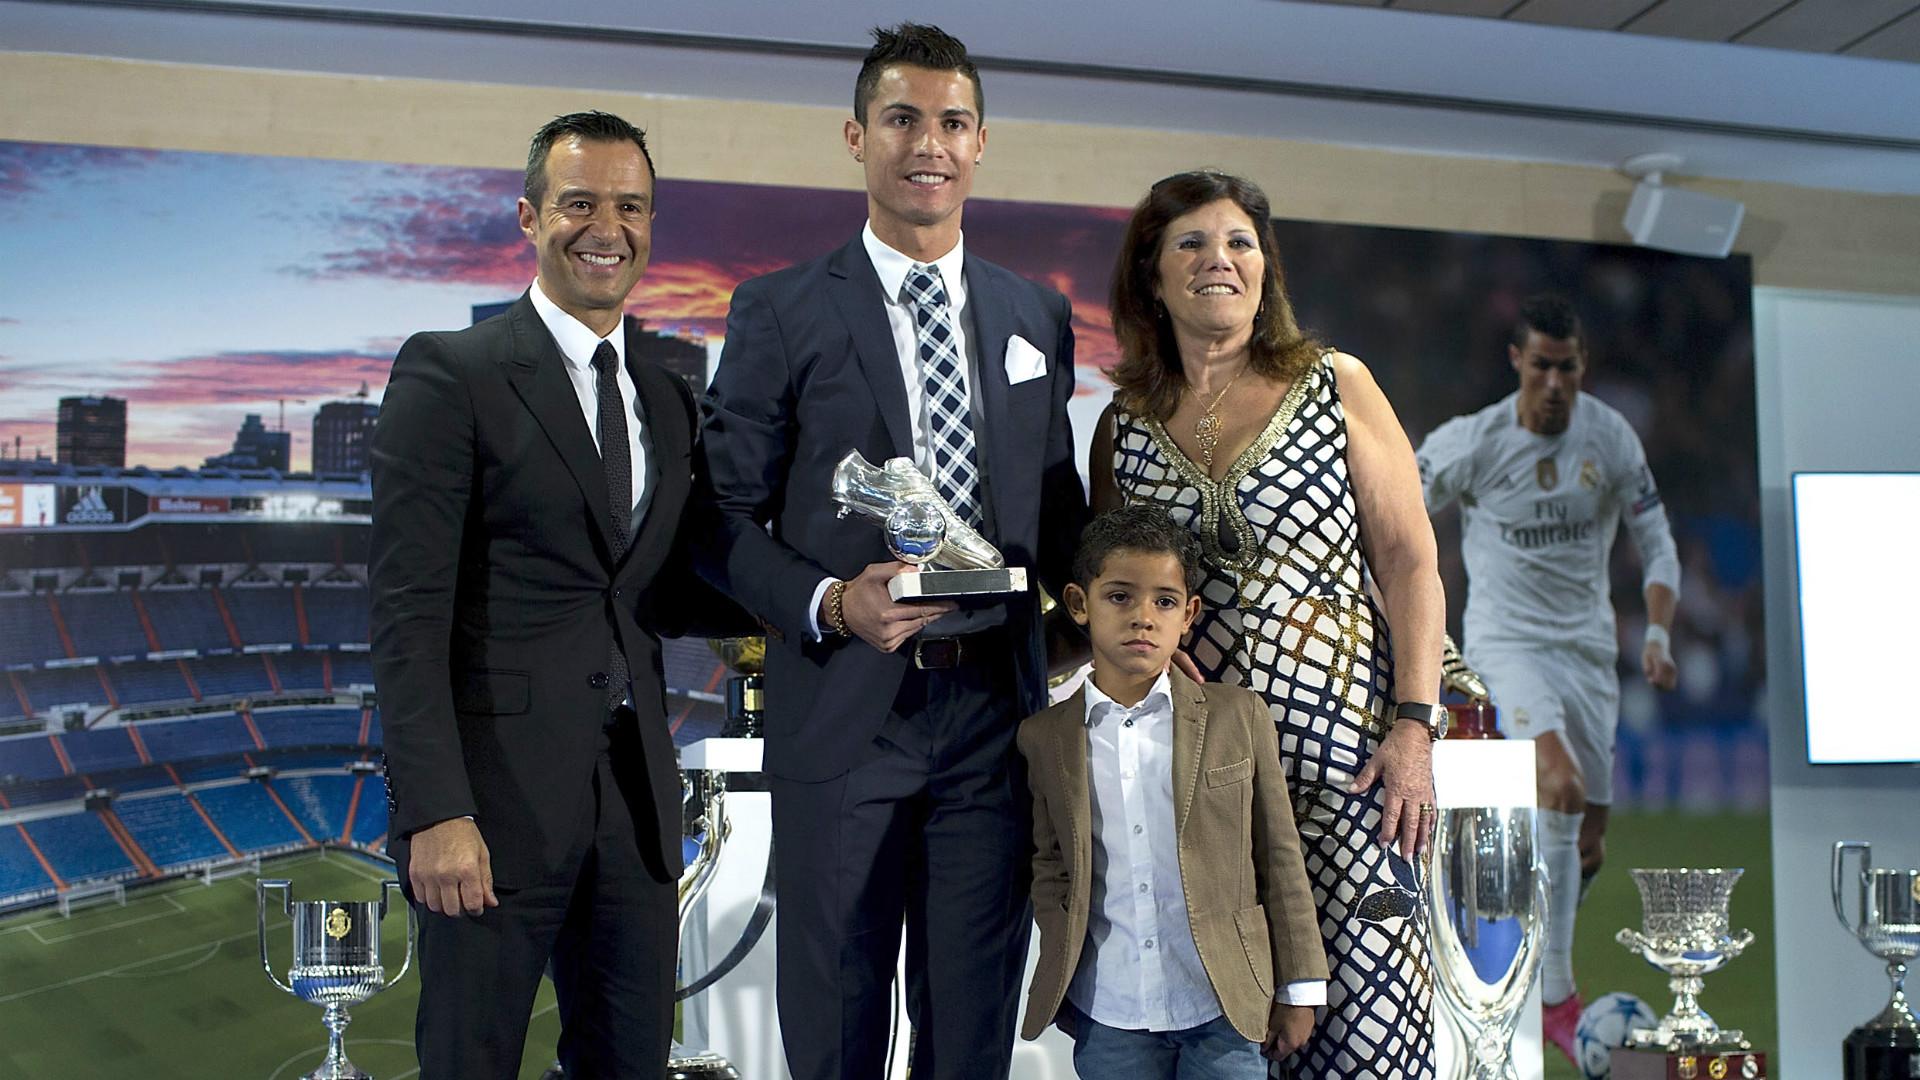 Cristiano Ronaldo acusado por defraudar suma millonaria al fisco